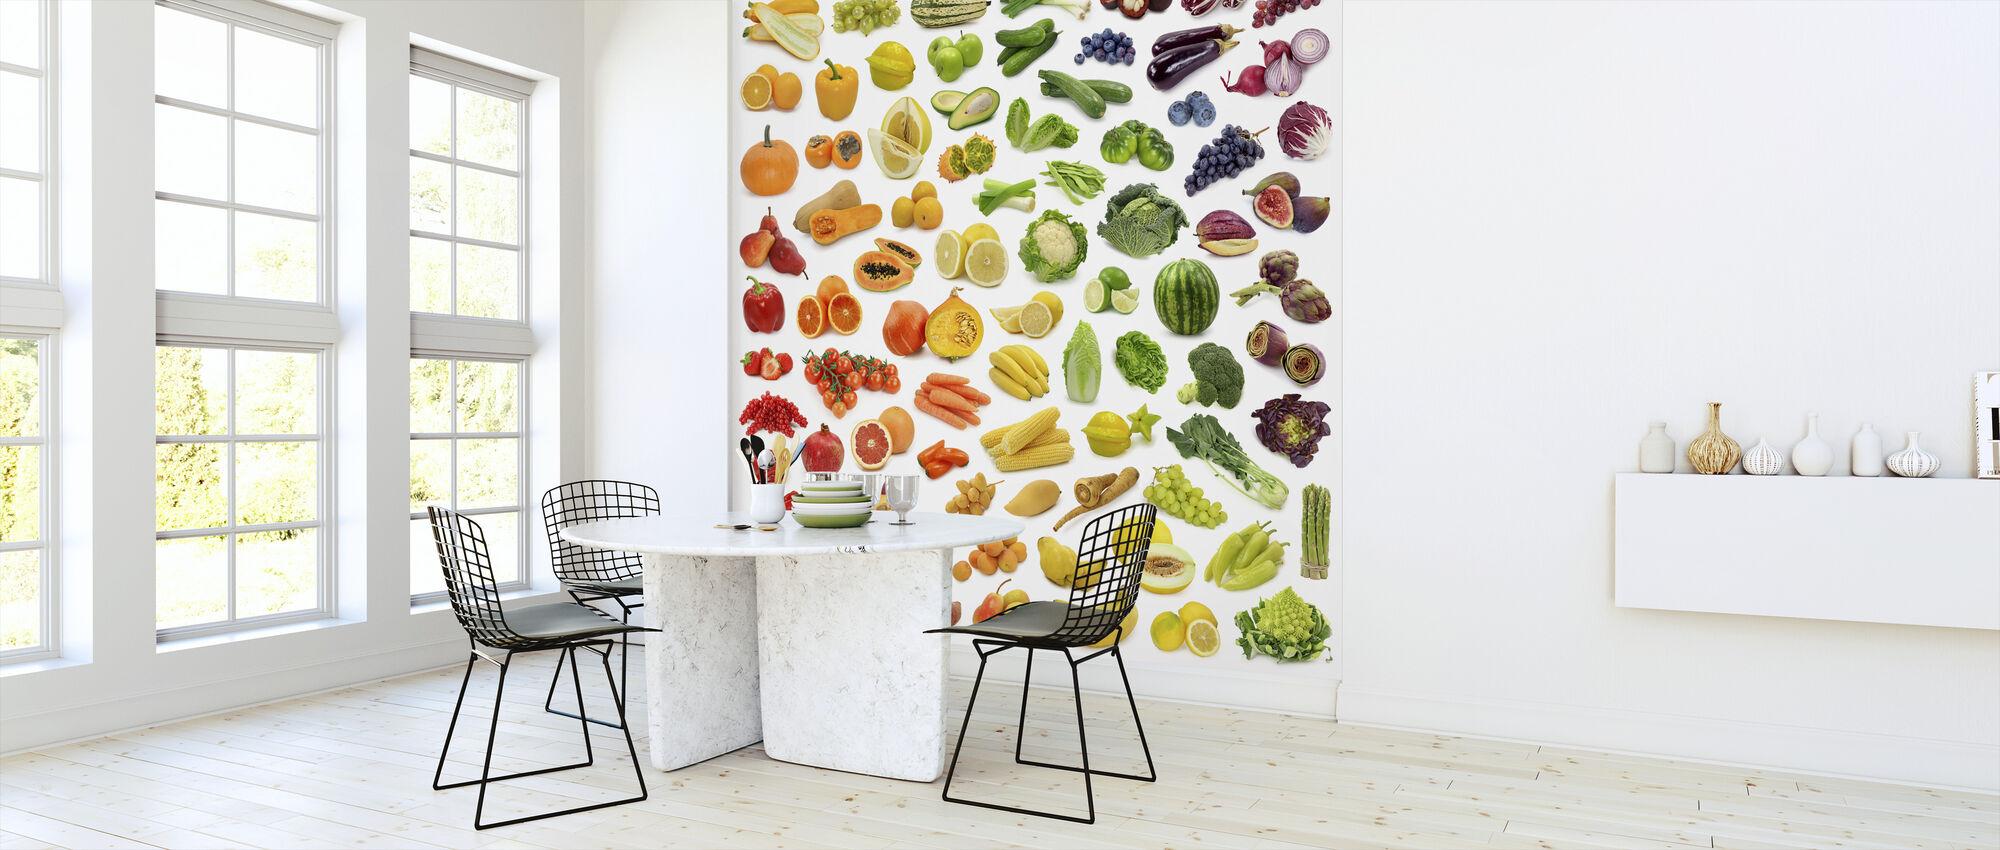 Juicy Fruits - Wallpaper - Kitchen